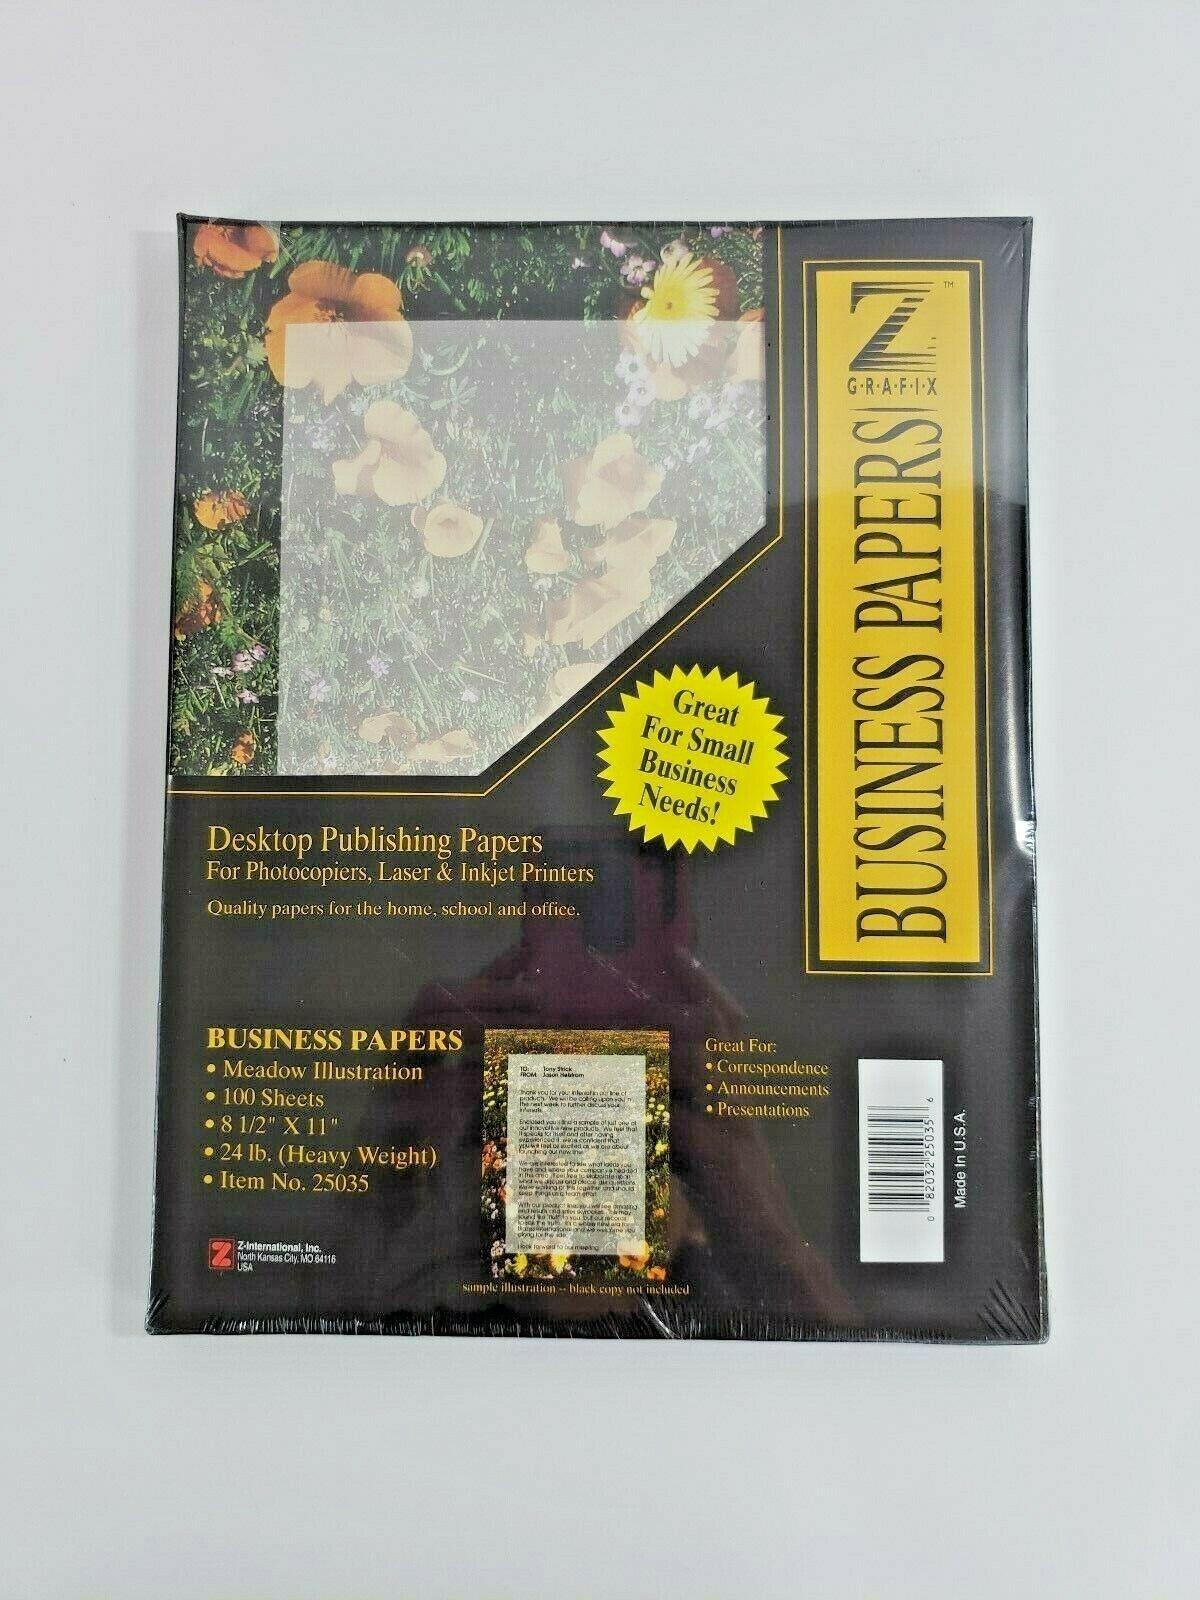 Z Grafix Desktop Publishing Paper 100 Sheets Gradated Design 8 1 2 X 11 Flower For Sale Online